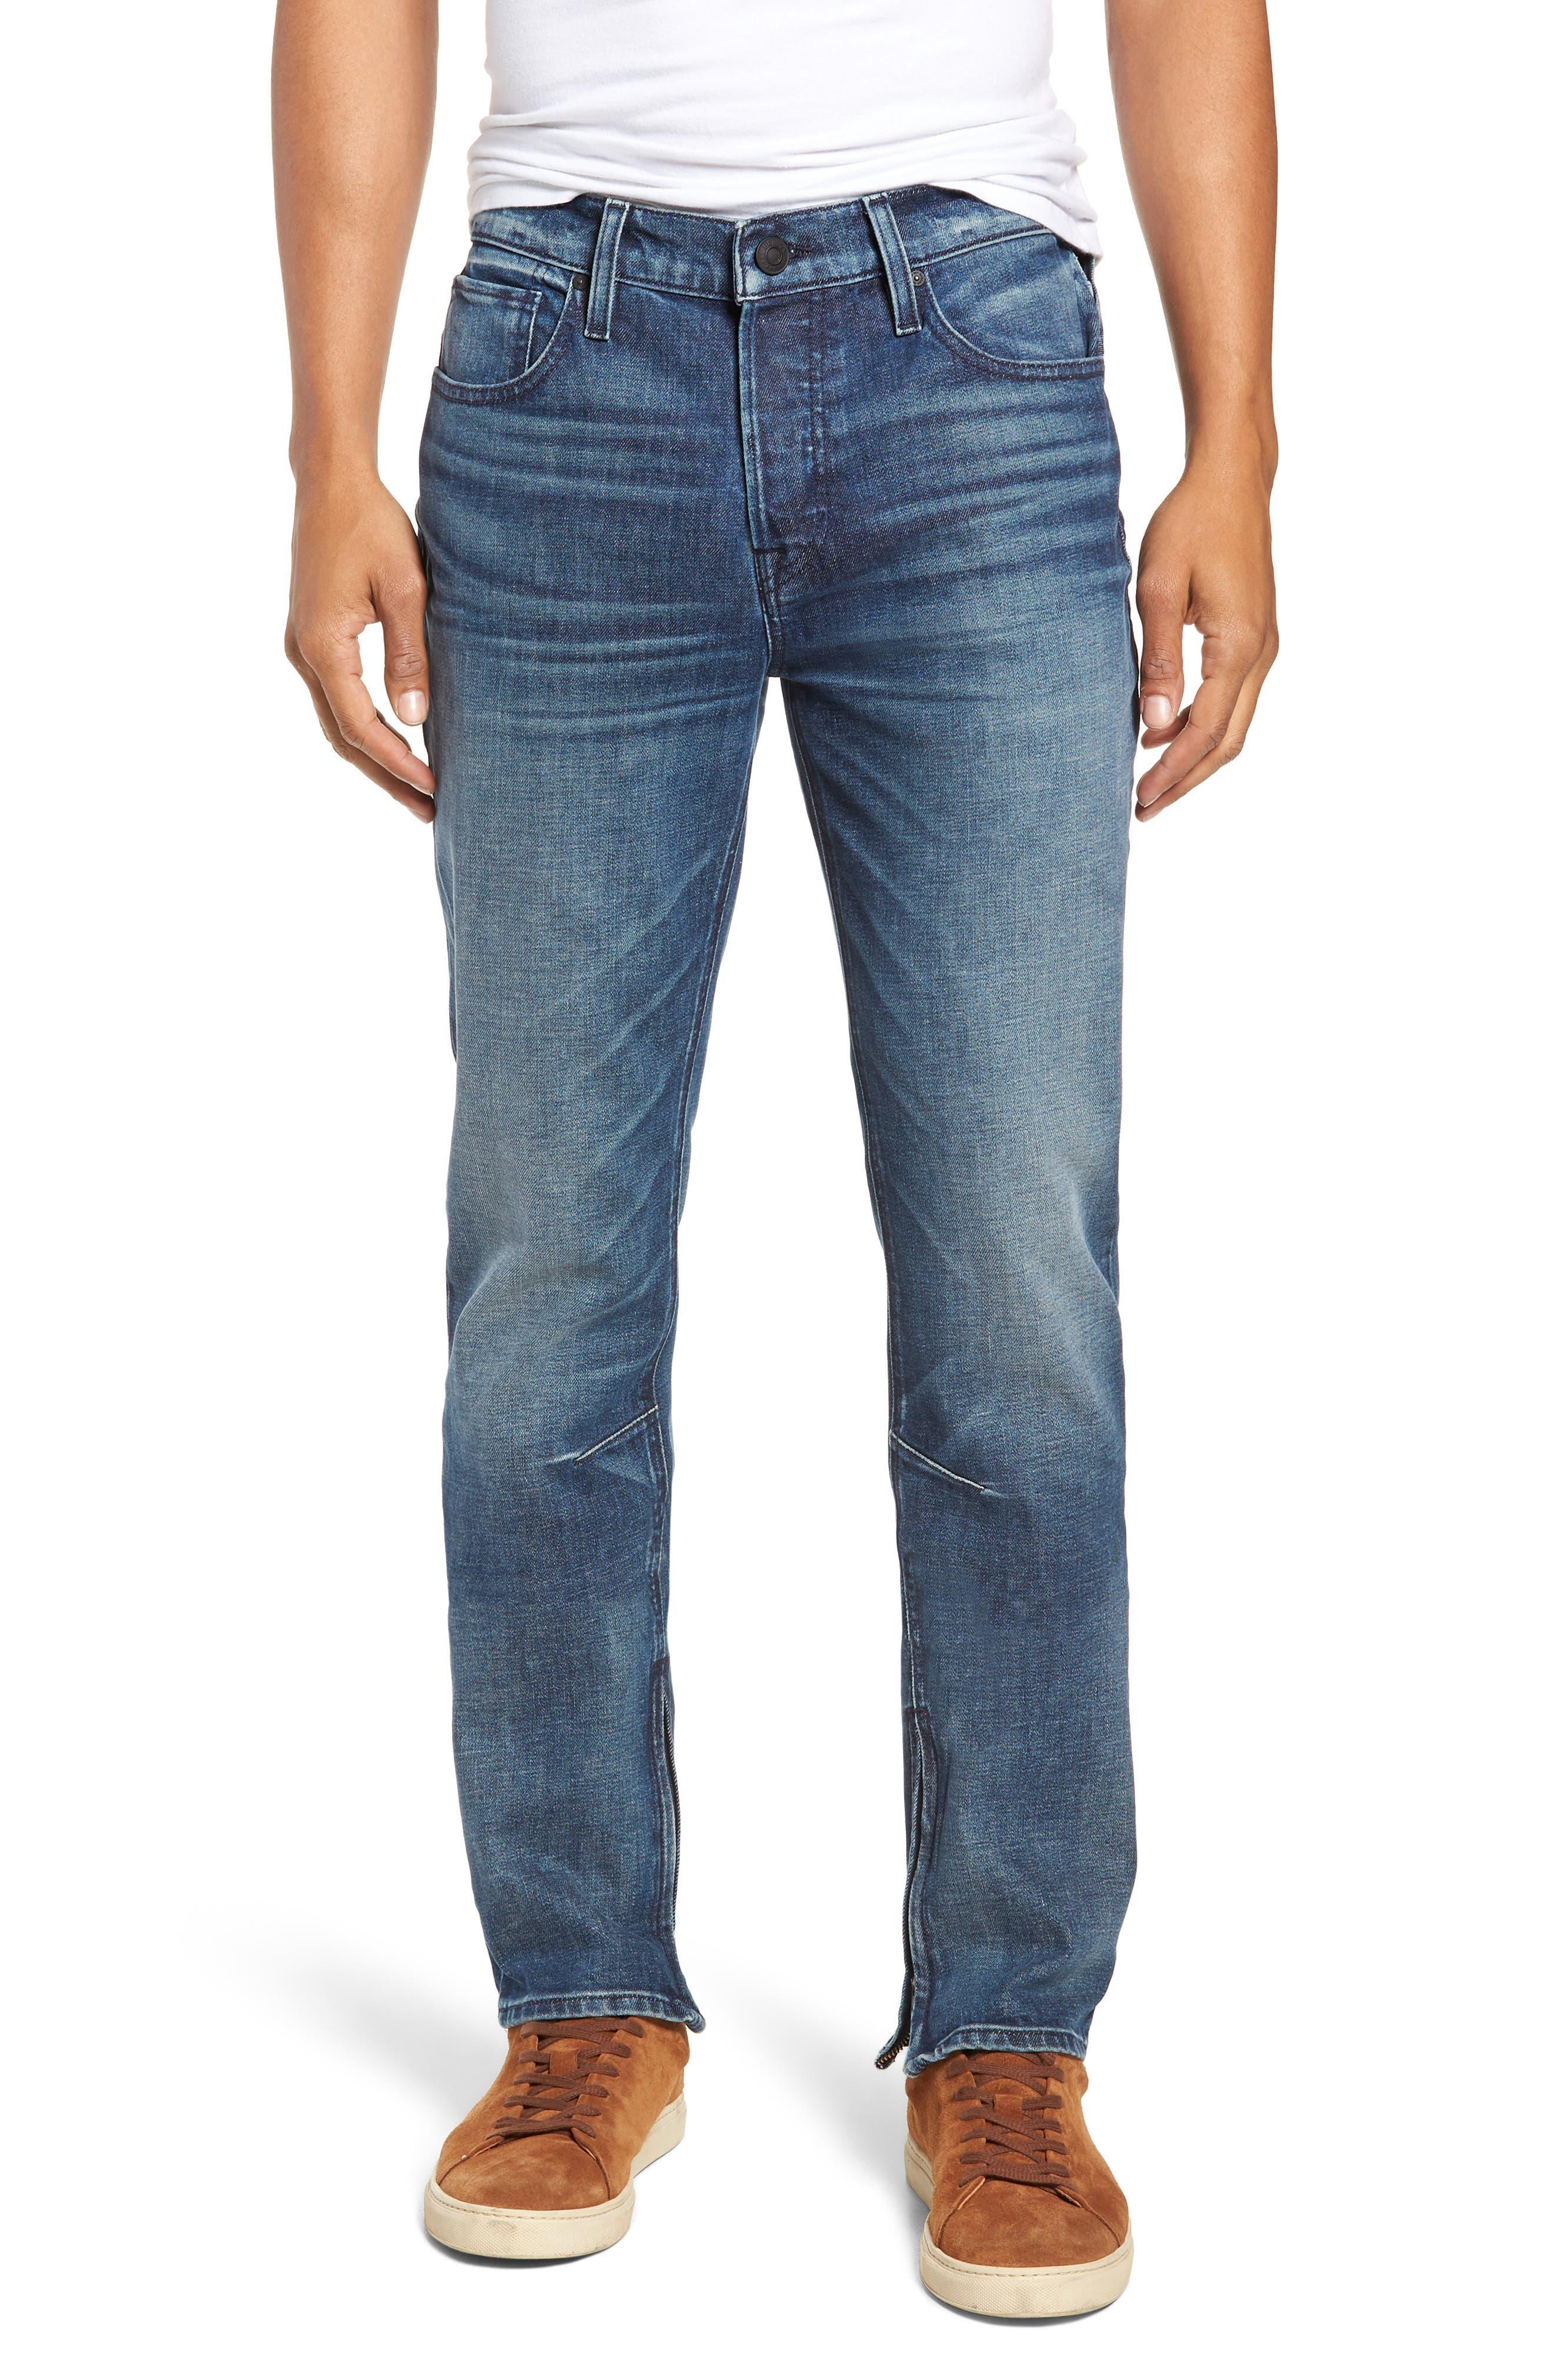 HUDSON Vaughn Ankle-Zip Skinny Fit Jeans In Franklin